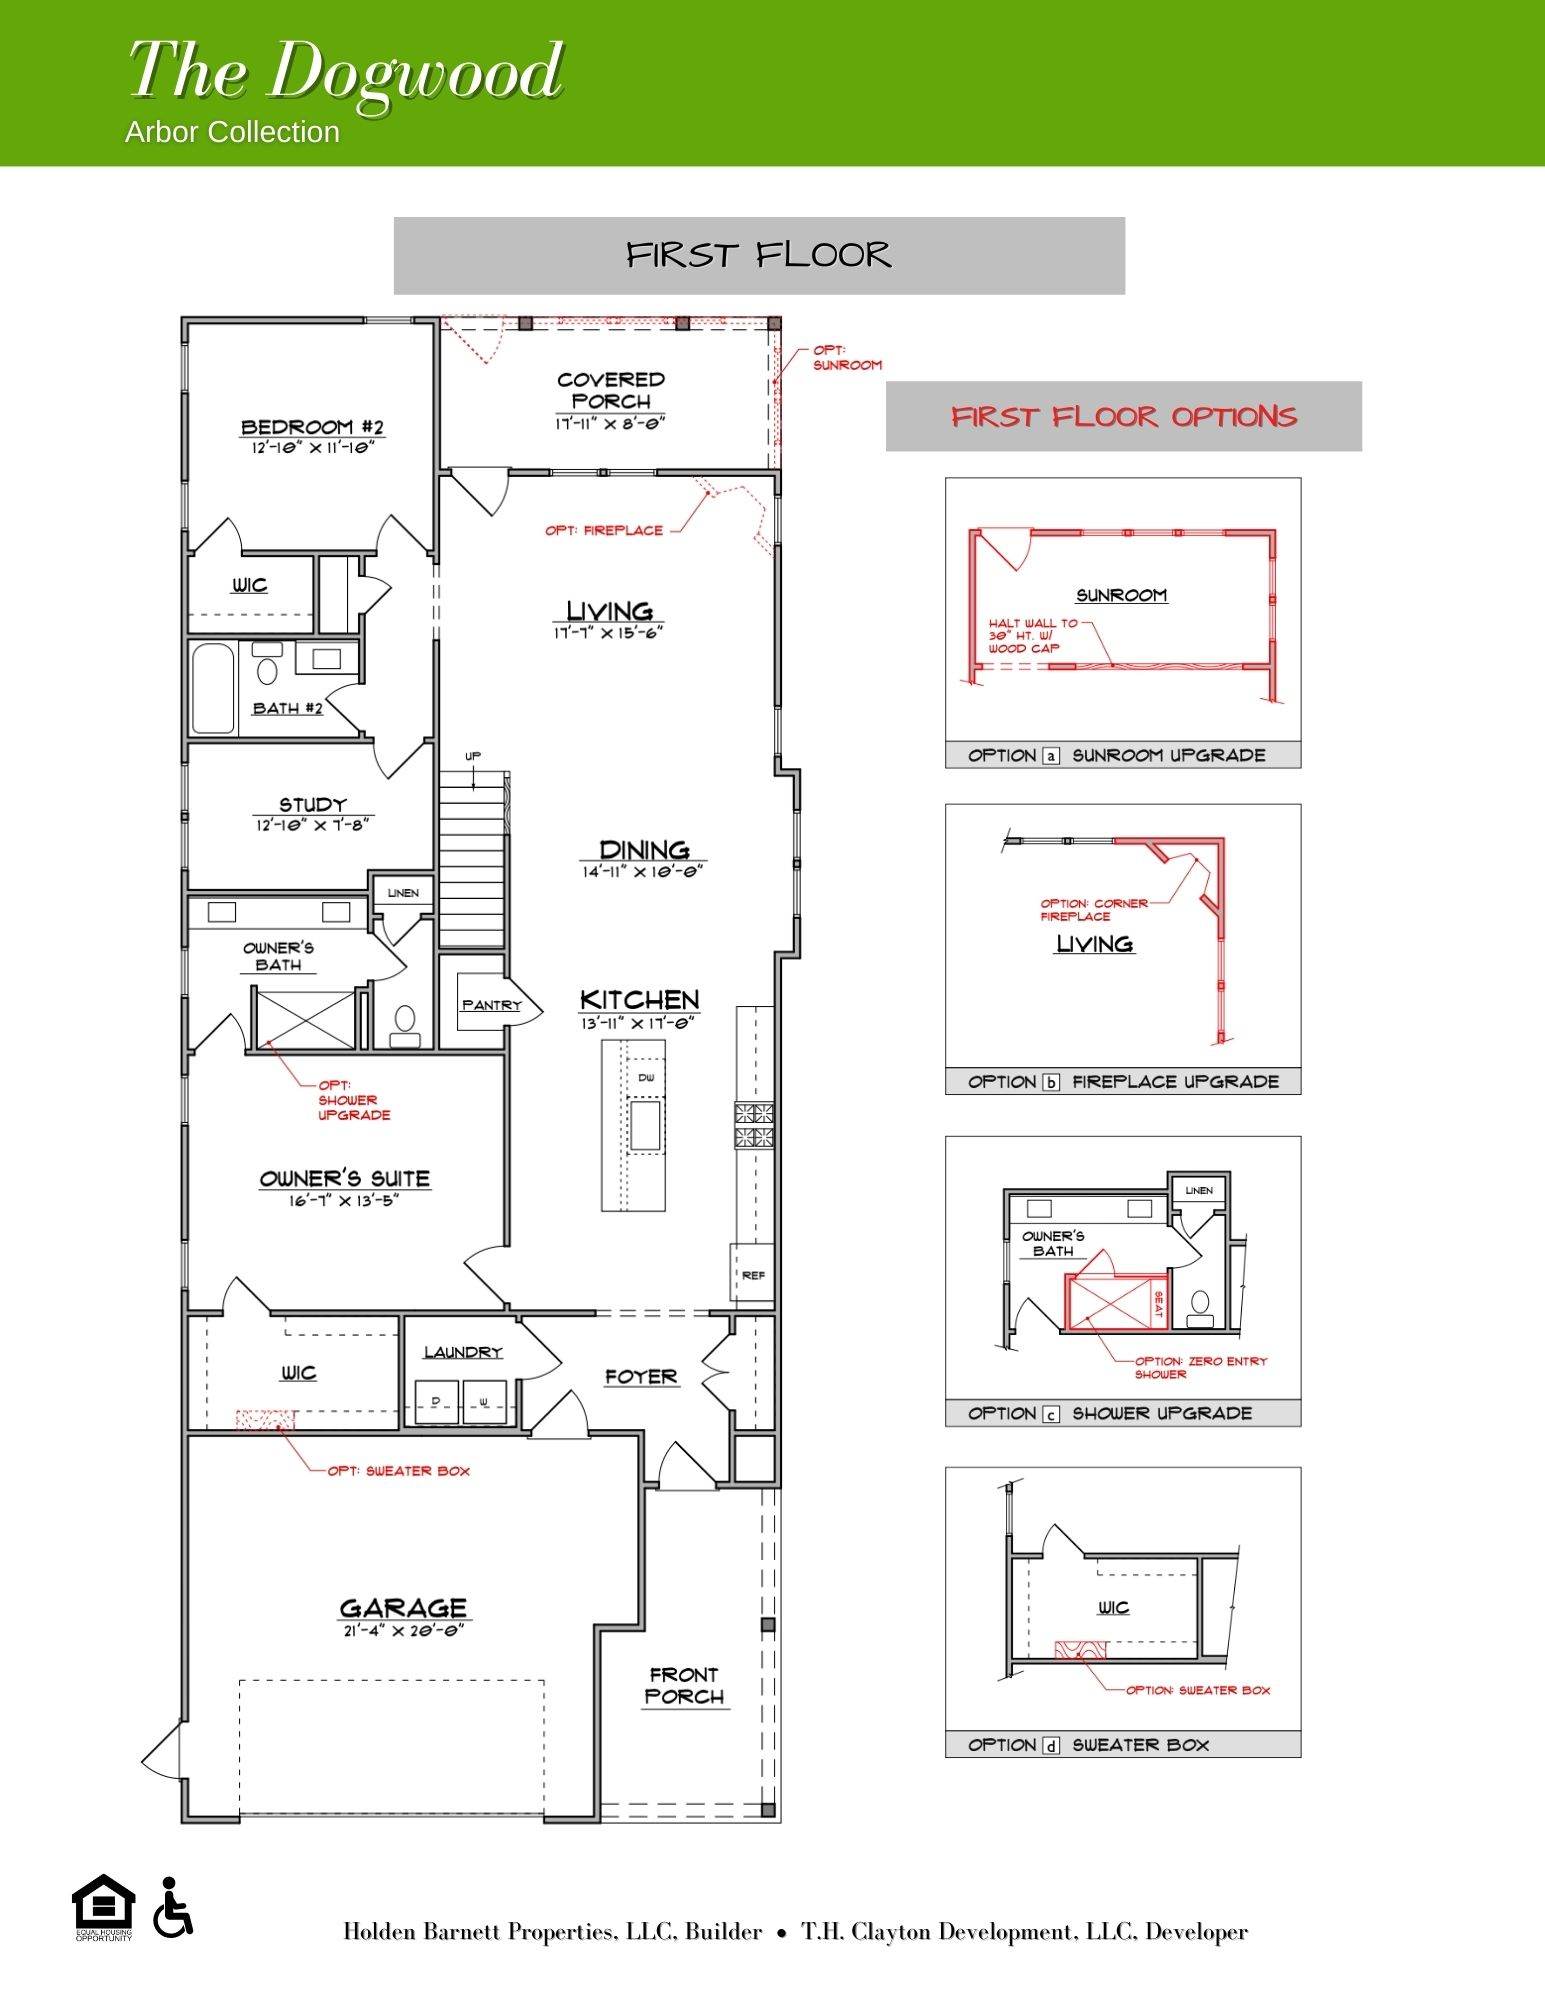 The Dogwood First Floor Floorplan